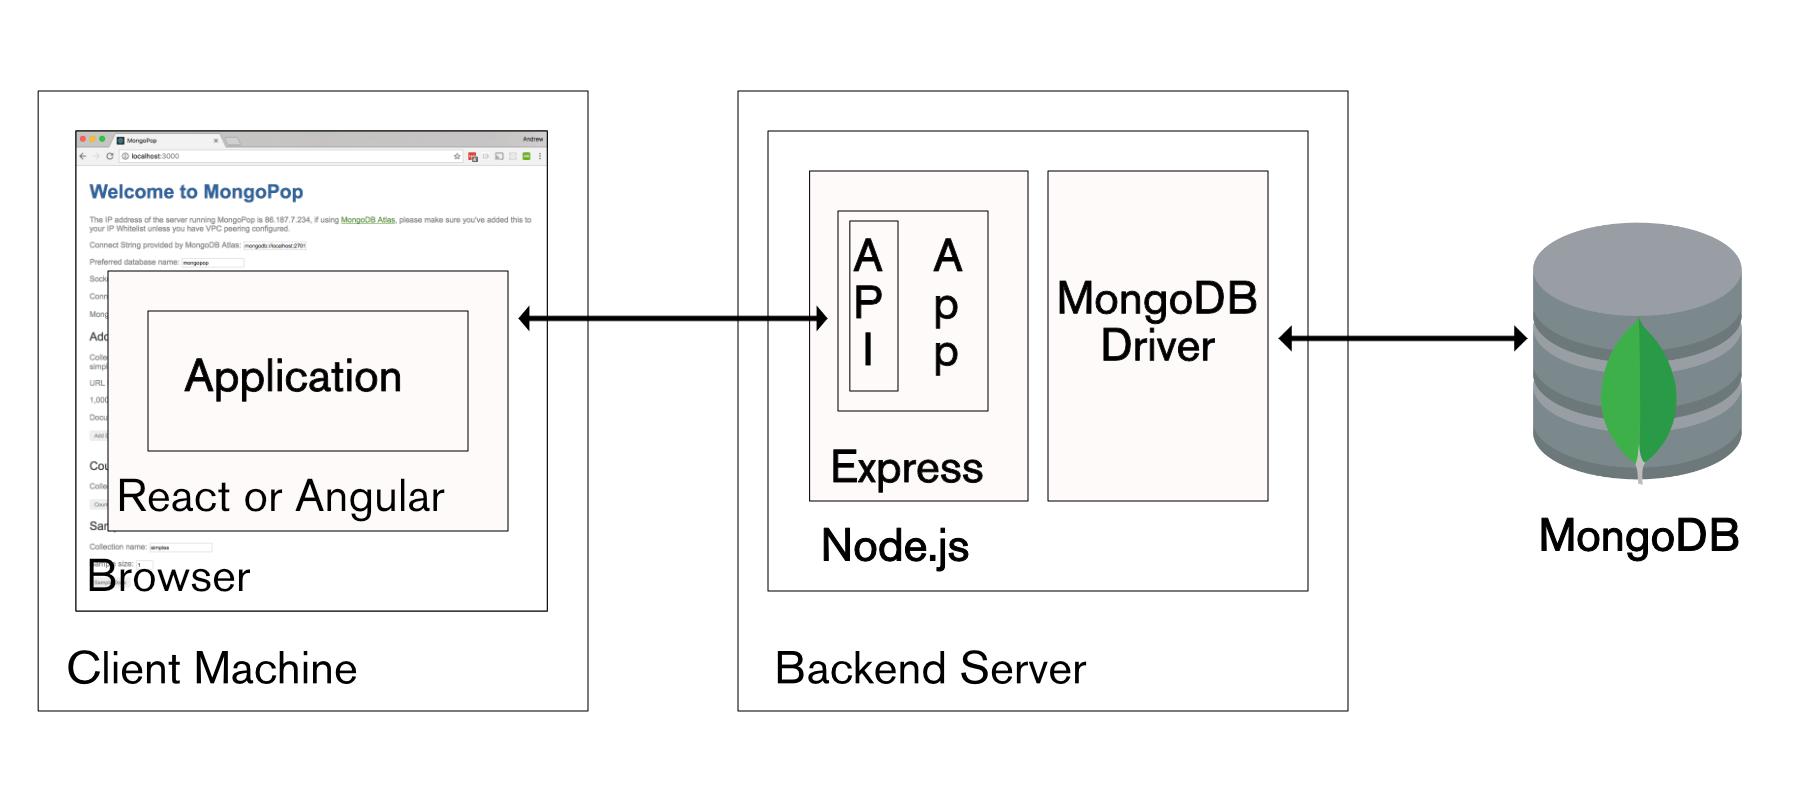 mern | Andrew Morgan on Databases